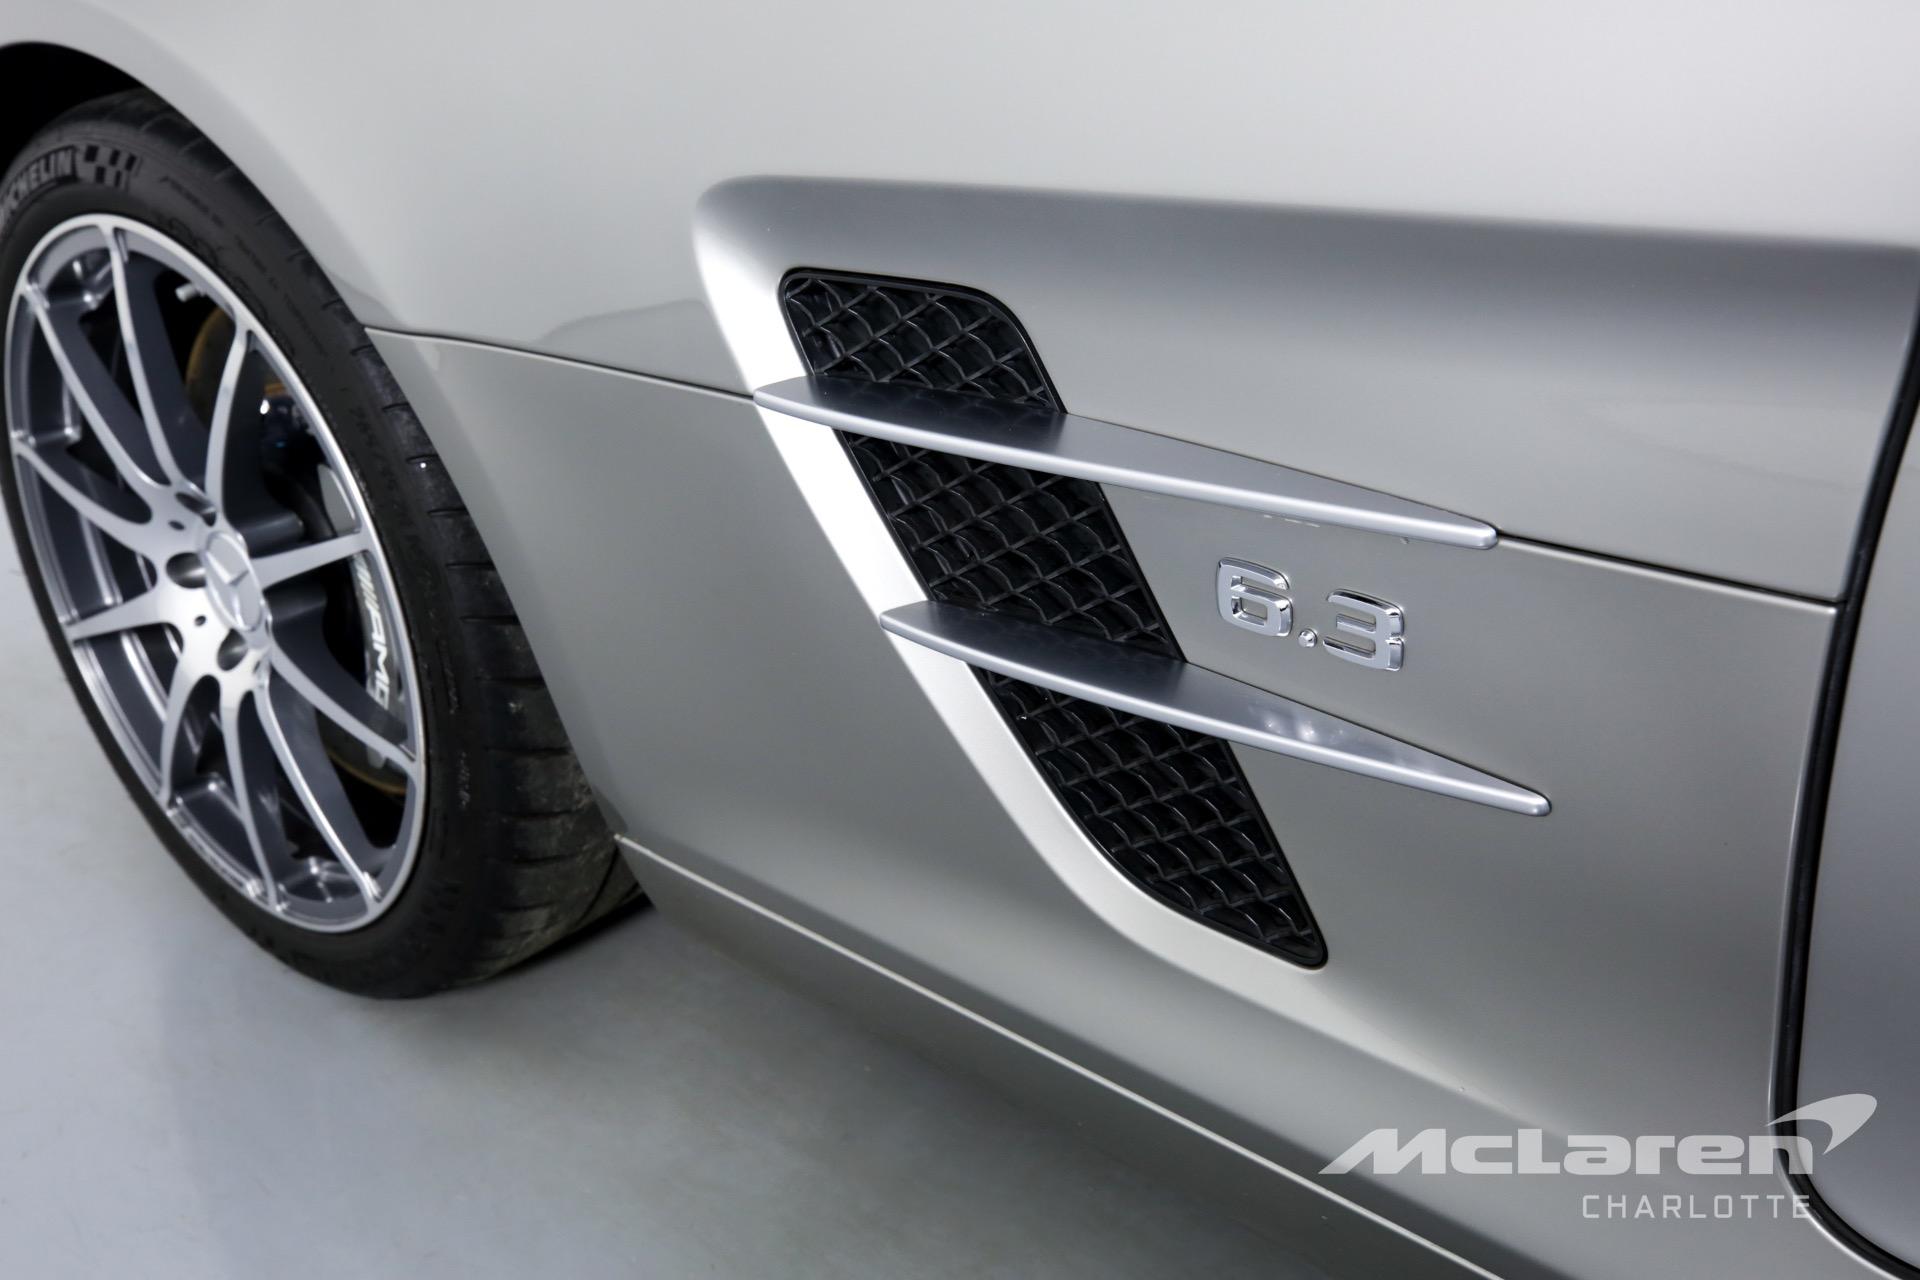 Used 2011 Mercedes-Benz SLS AMG  | Charlotte, NC